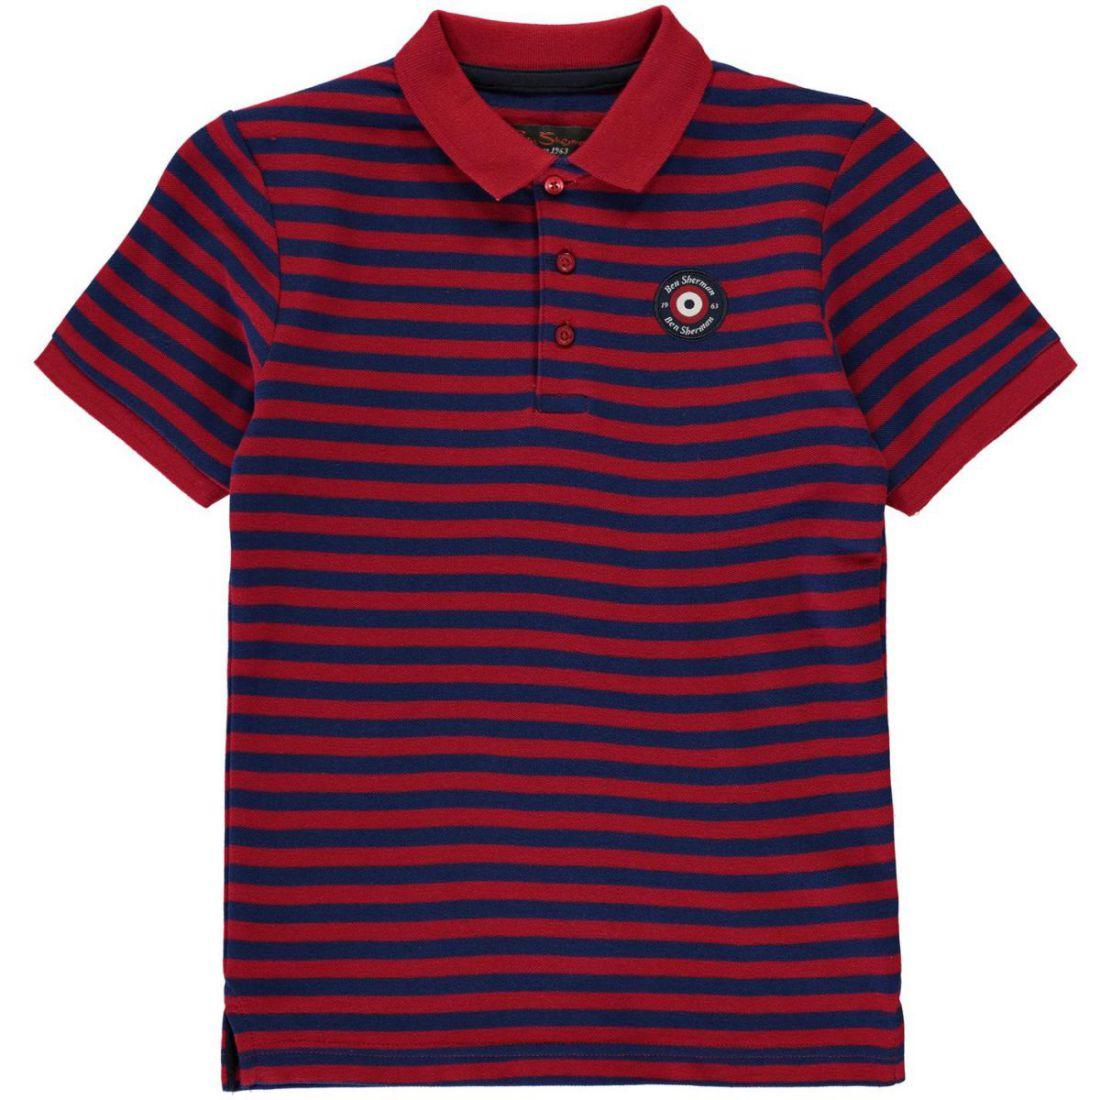 f4dafc491 Kids Ben Sherman Stripe Target Polo Shirt Classic Fit Short Sleeve New